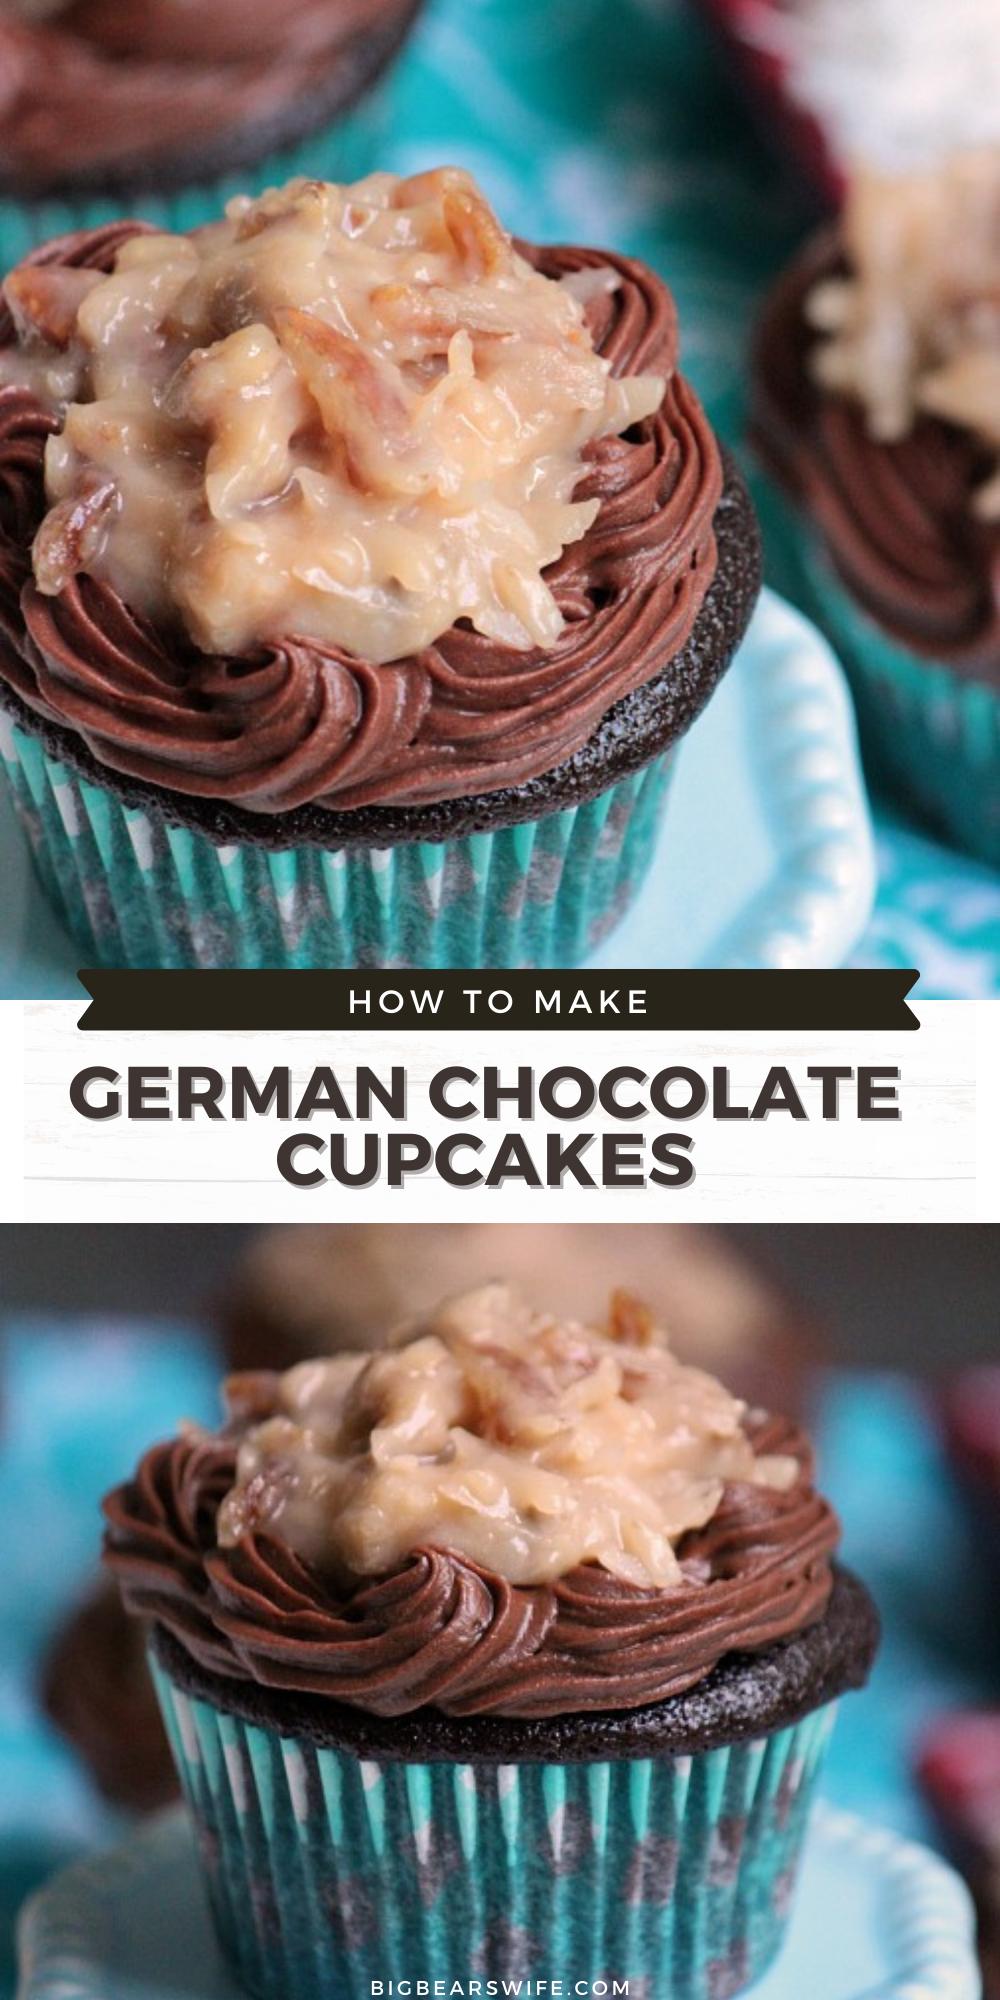 German Chocolate Cupcakes - Homemade Chocolate Cupcakes with the most amazing German Chocolate Coconut Topping! via @bigbearswife